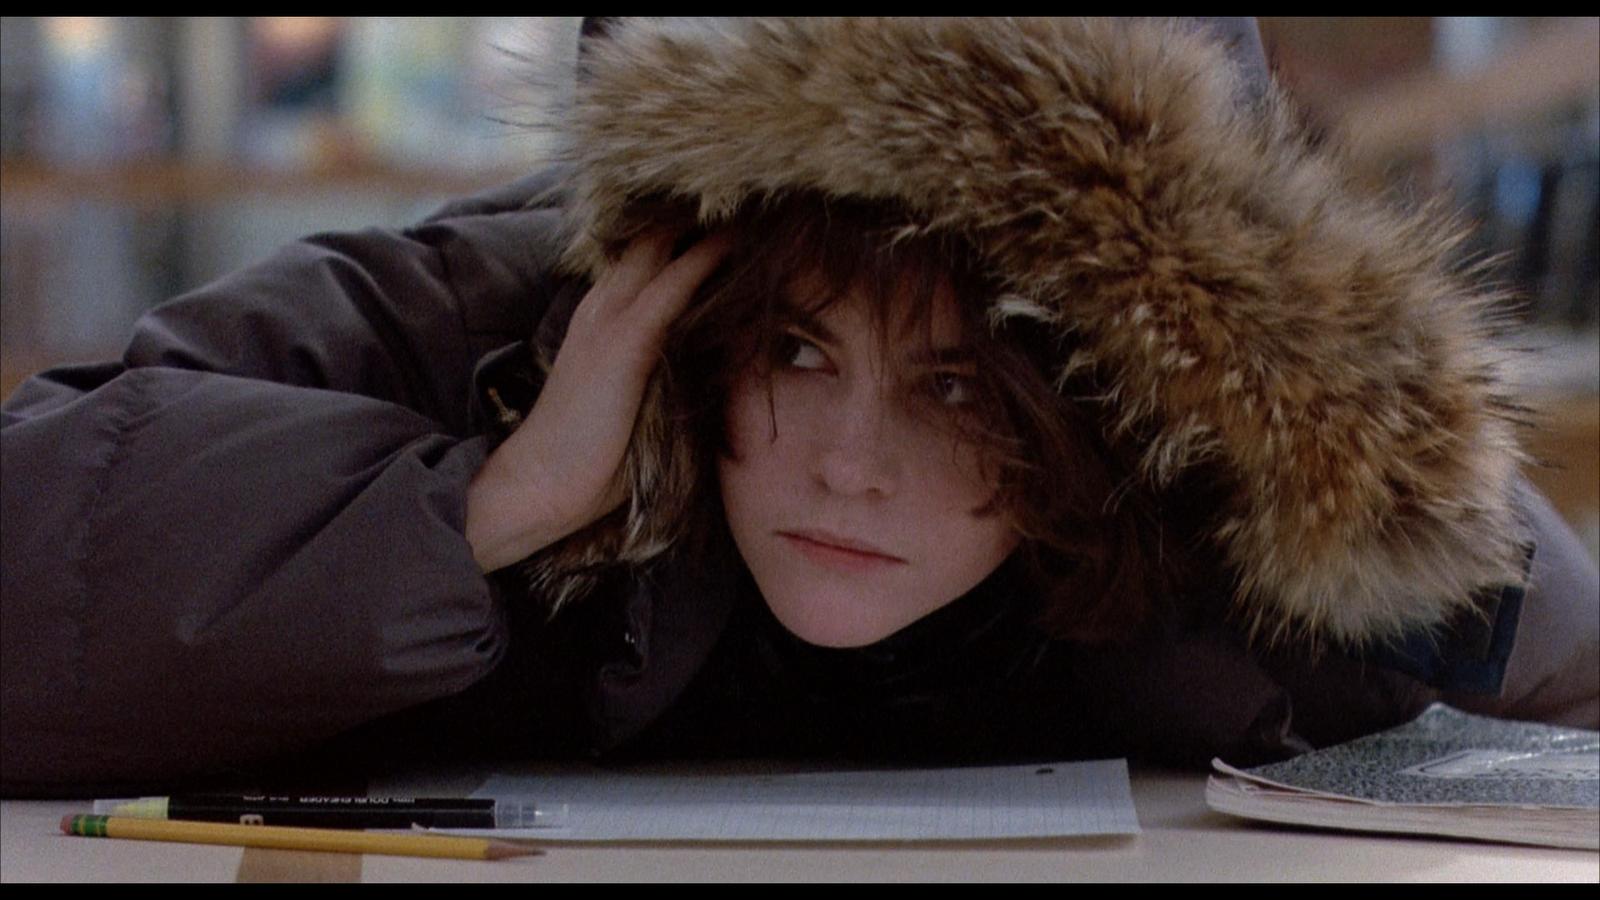 Fig. 3 - Allison Reynolds, as played by Ally Sheedy in the Breakfast Club